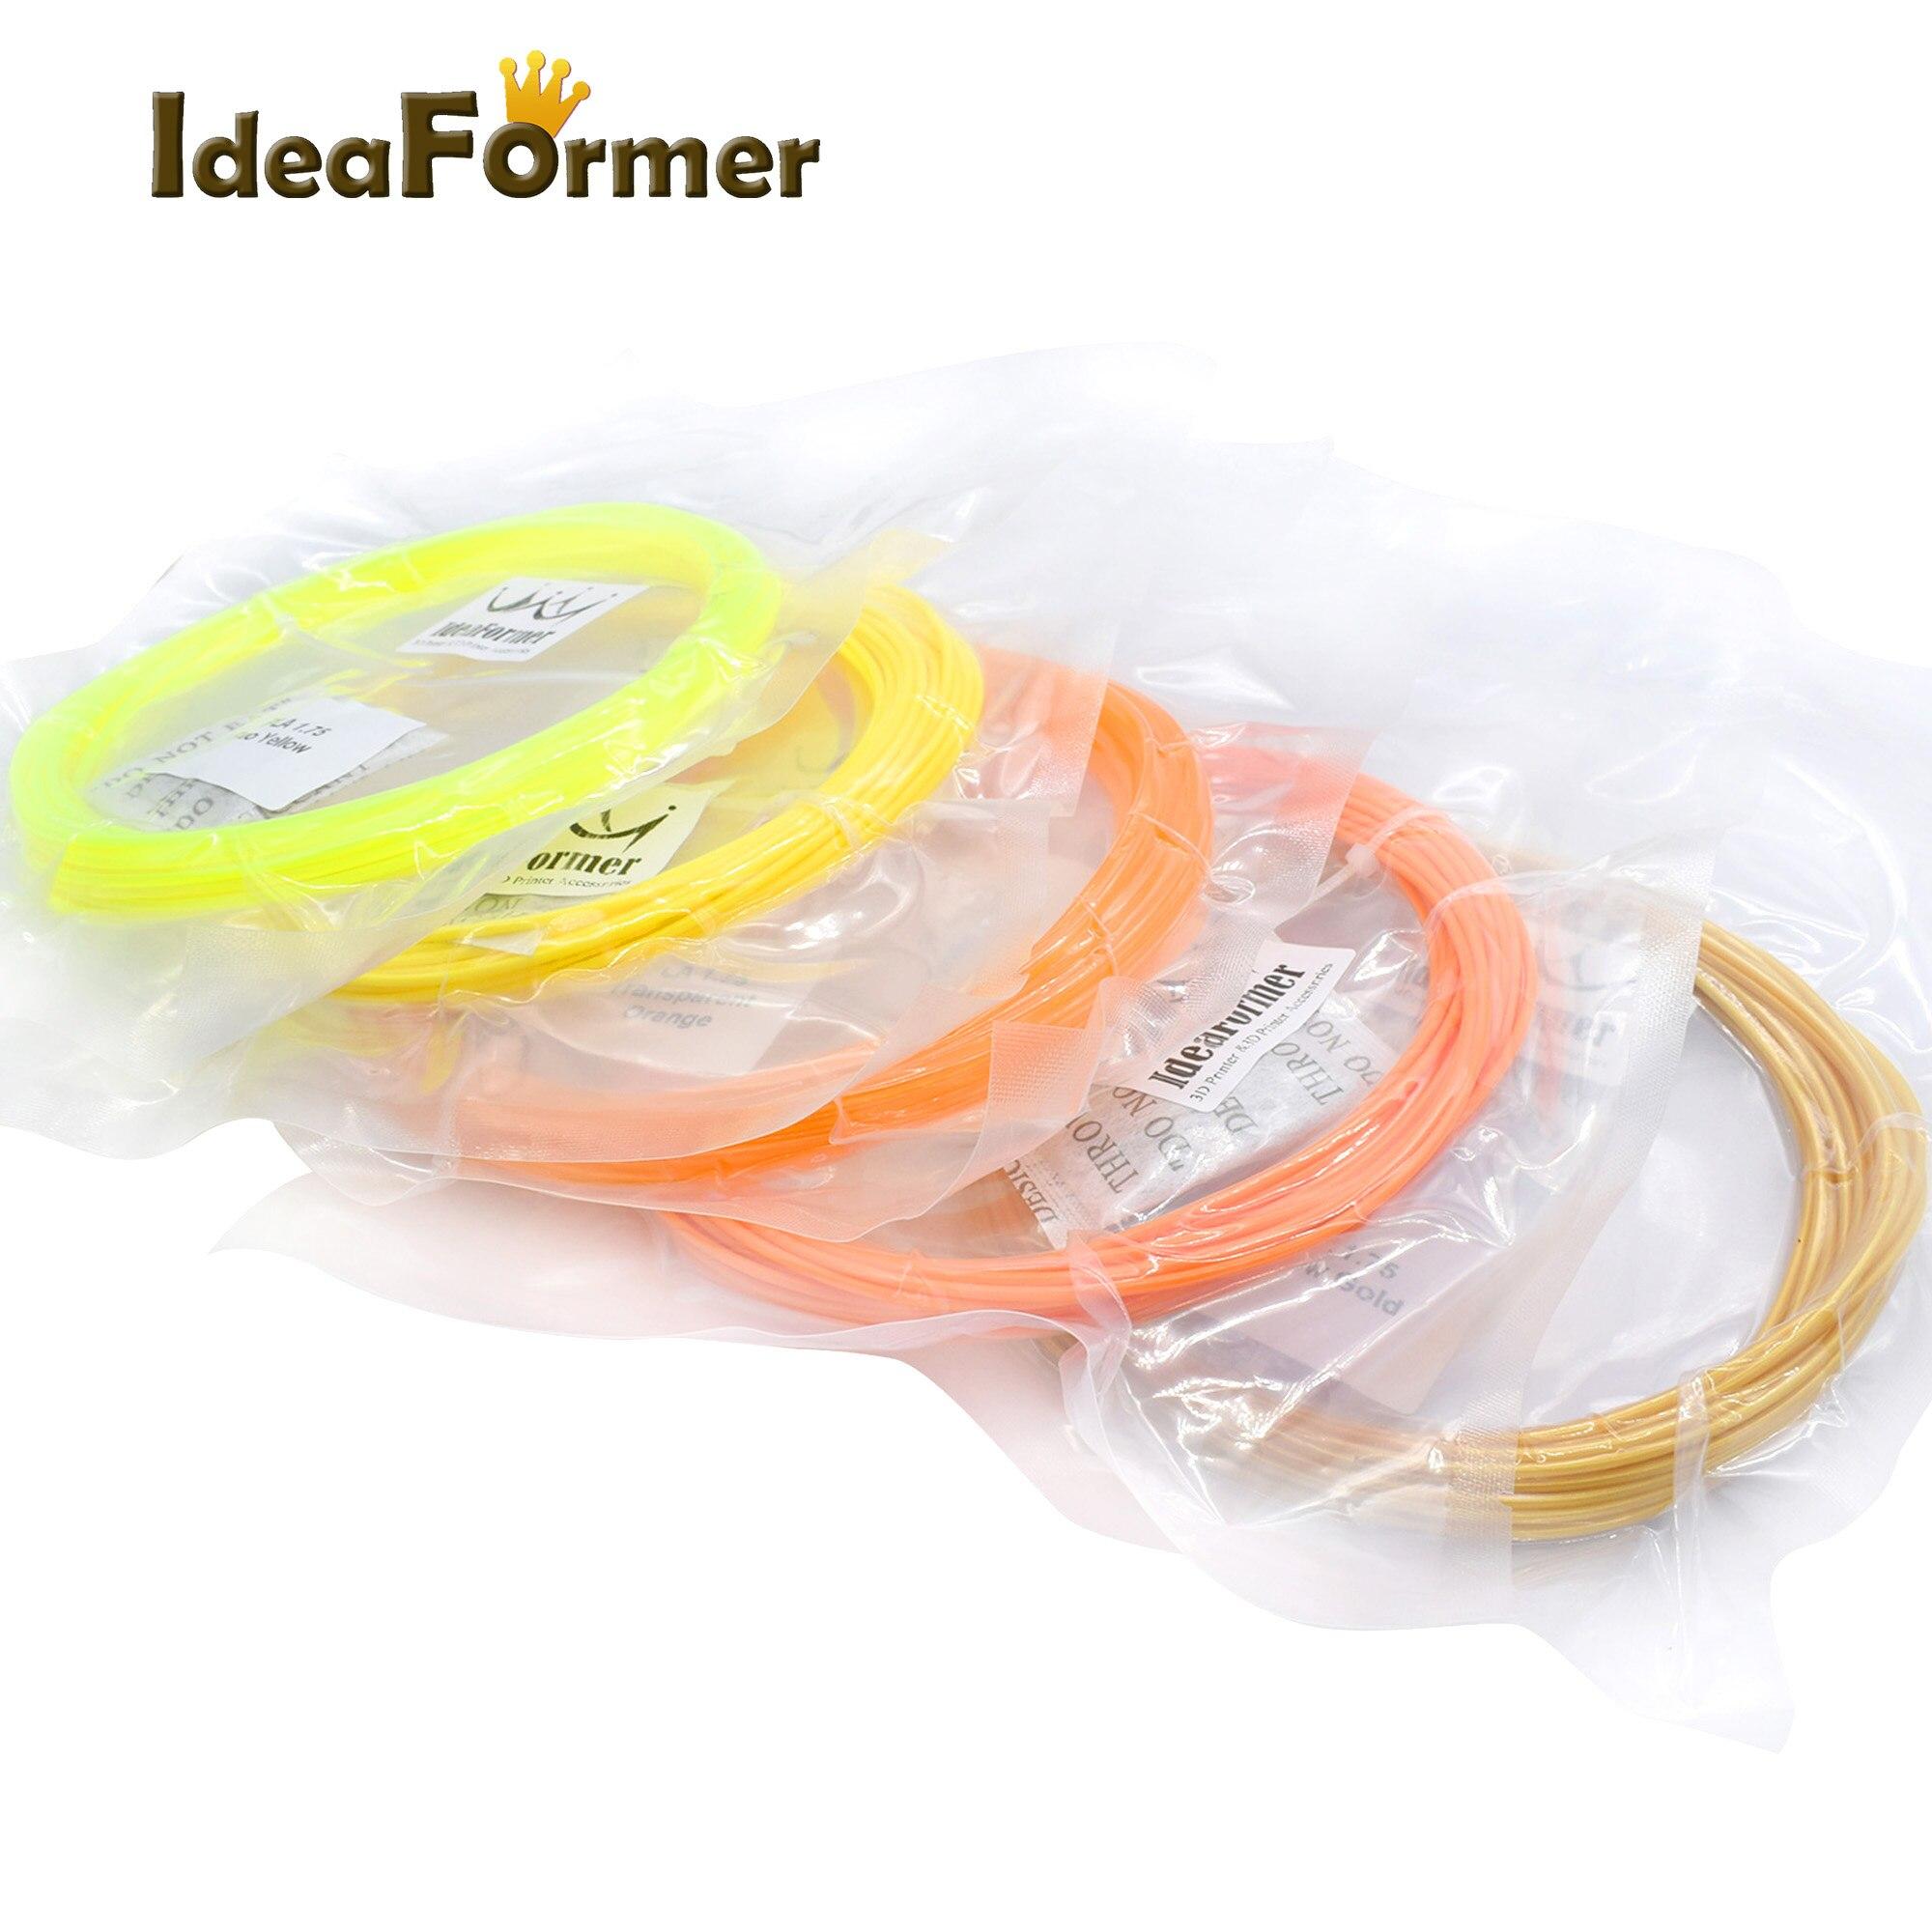 PLA filament 10M in lenght Diameter 1.75mm for 3D printing pen and 3D printer parts 1 75mm pla 3d printer filament printing refills 10m